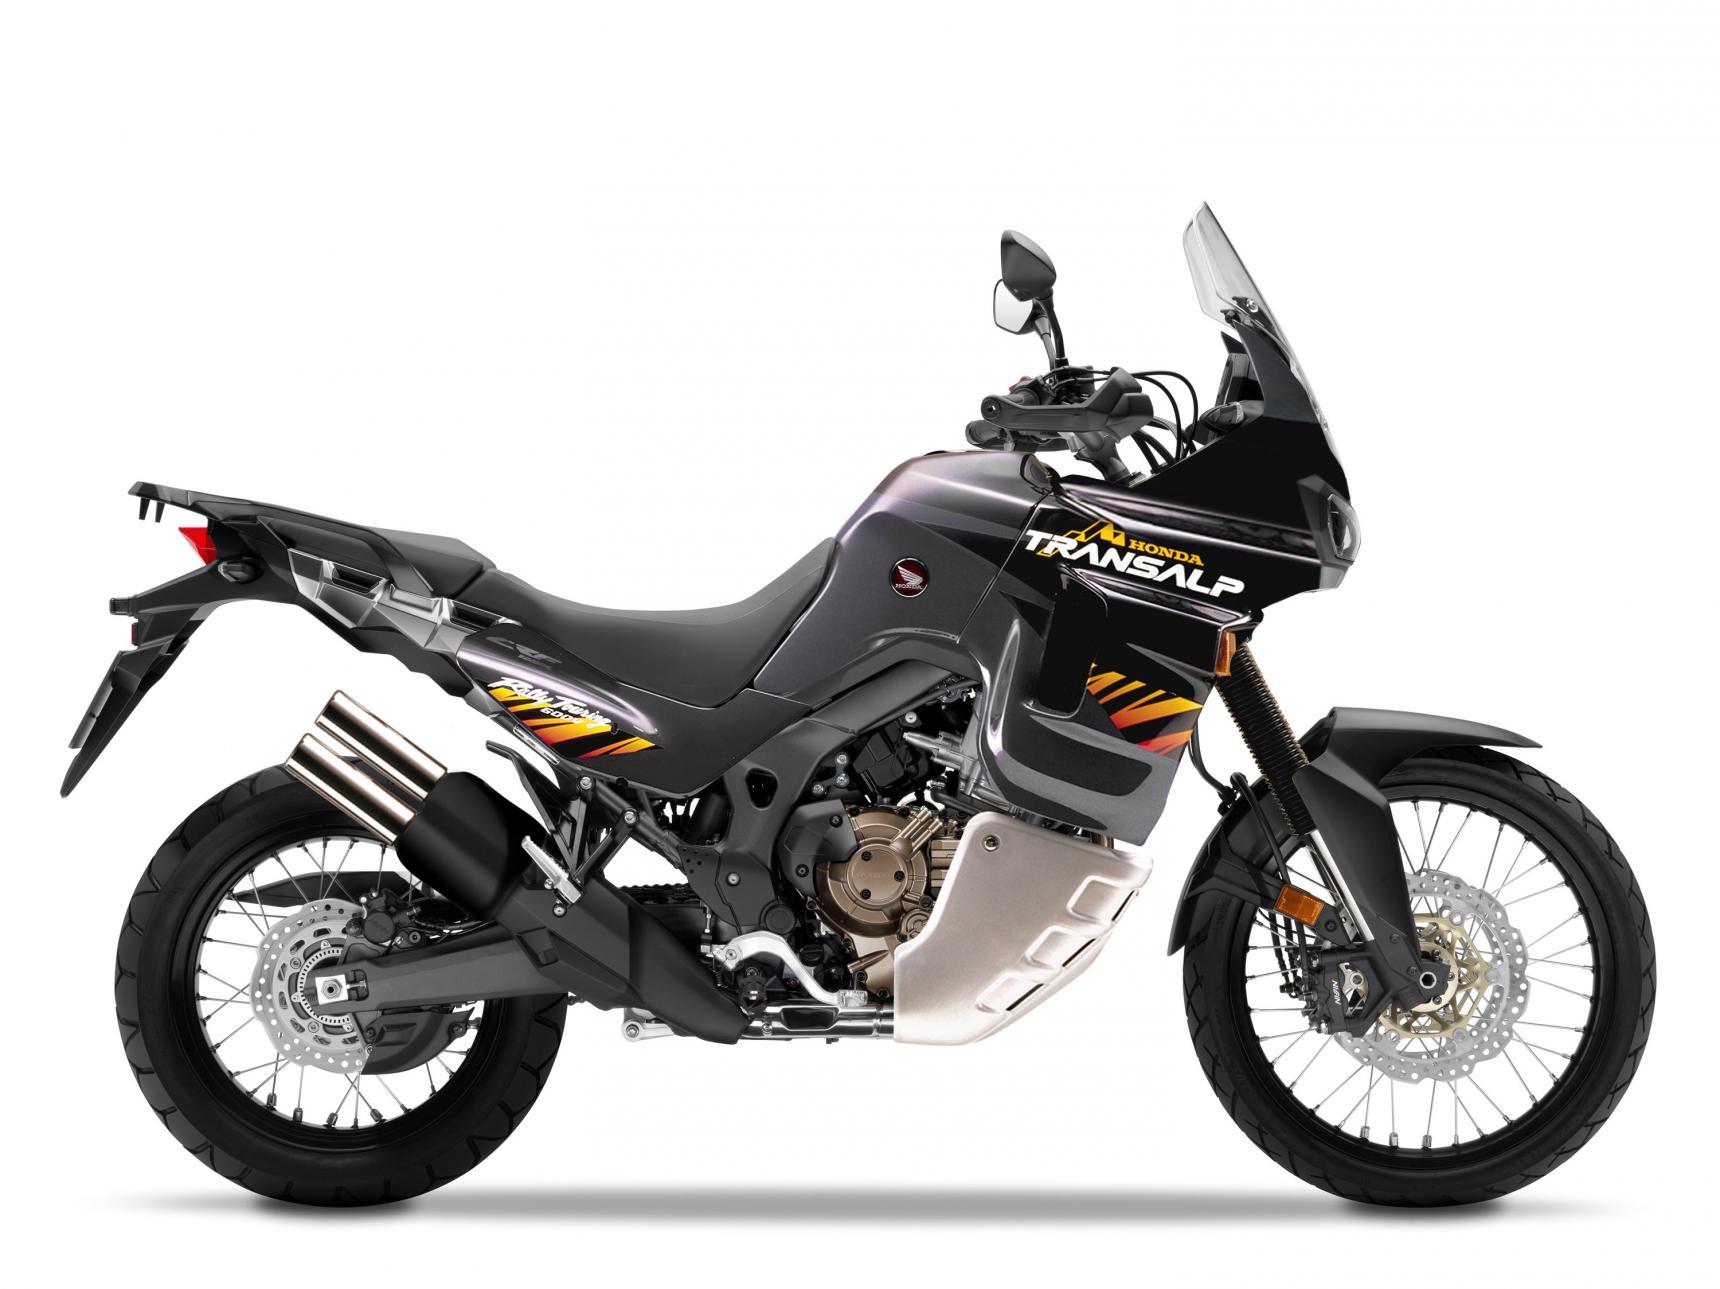 transalp 700 forum mototurismo. Black Bedroom Furniture Sets. Home Design Ideas